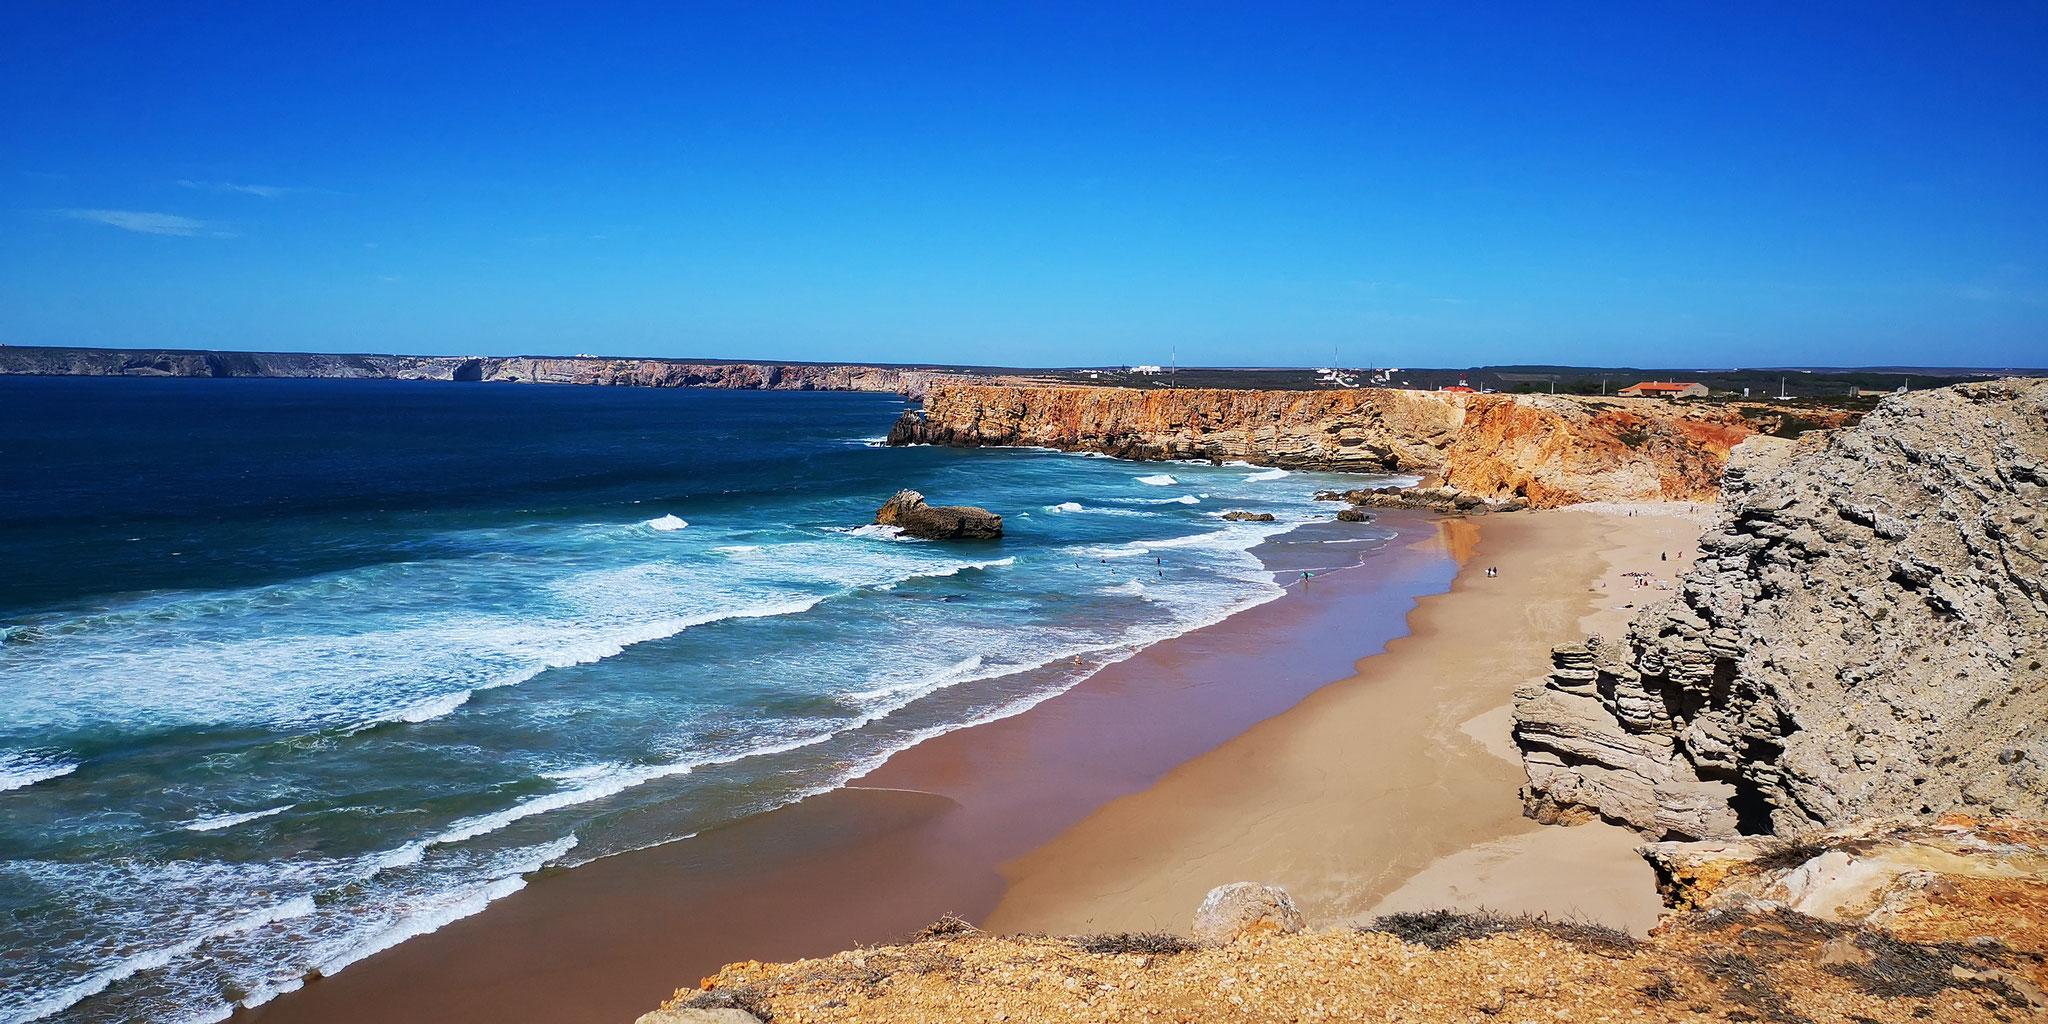 Portugal - Praia do Tonel